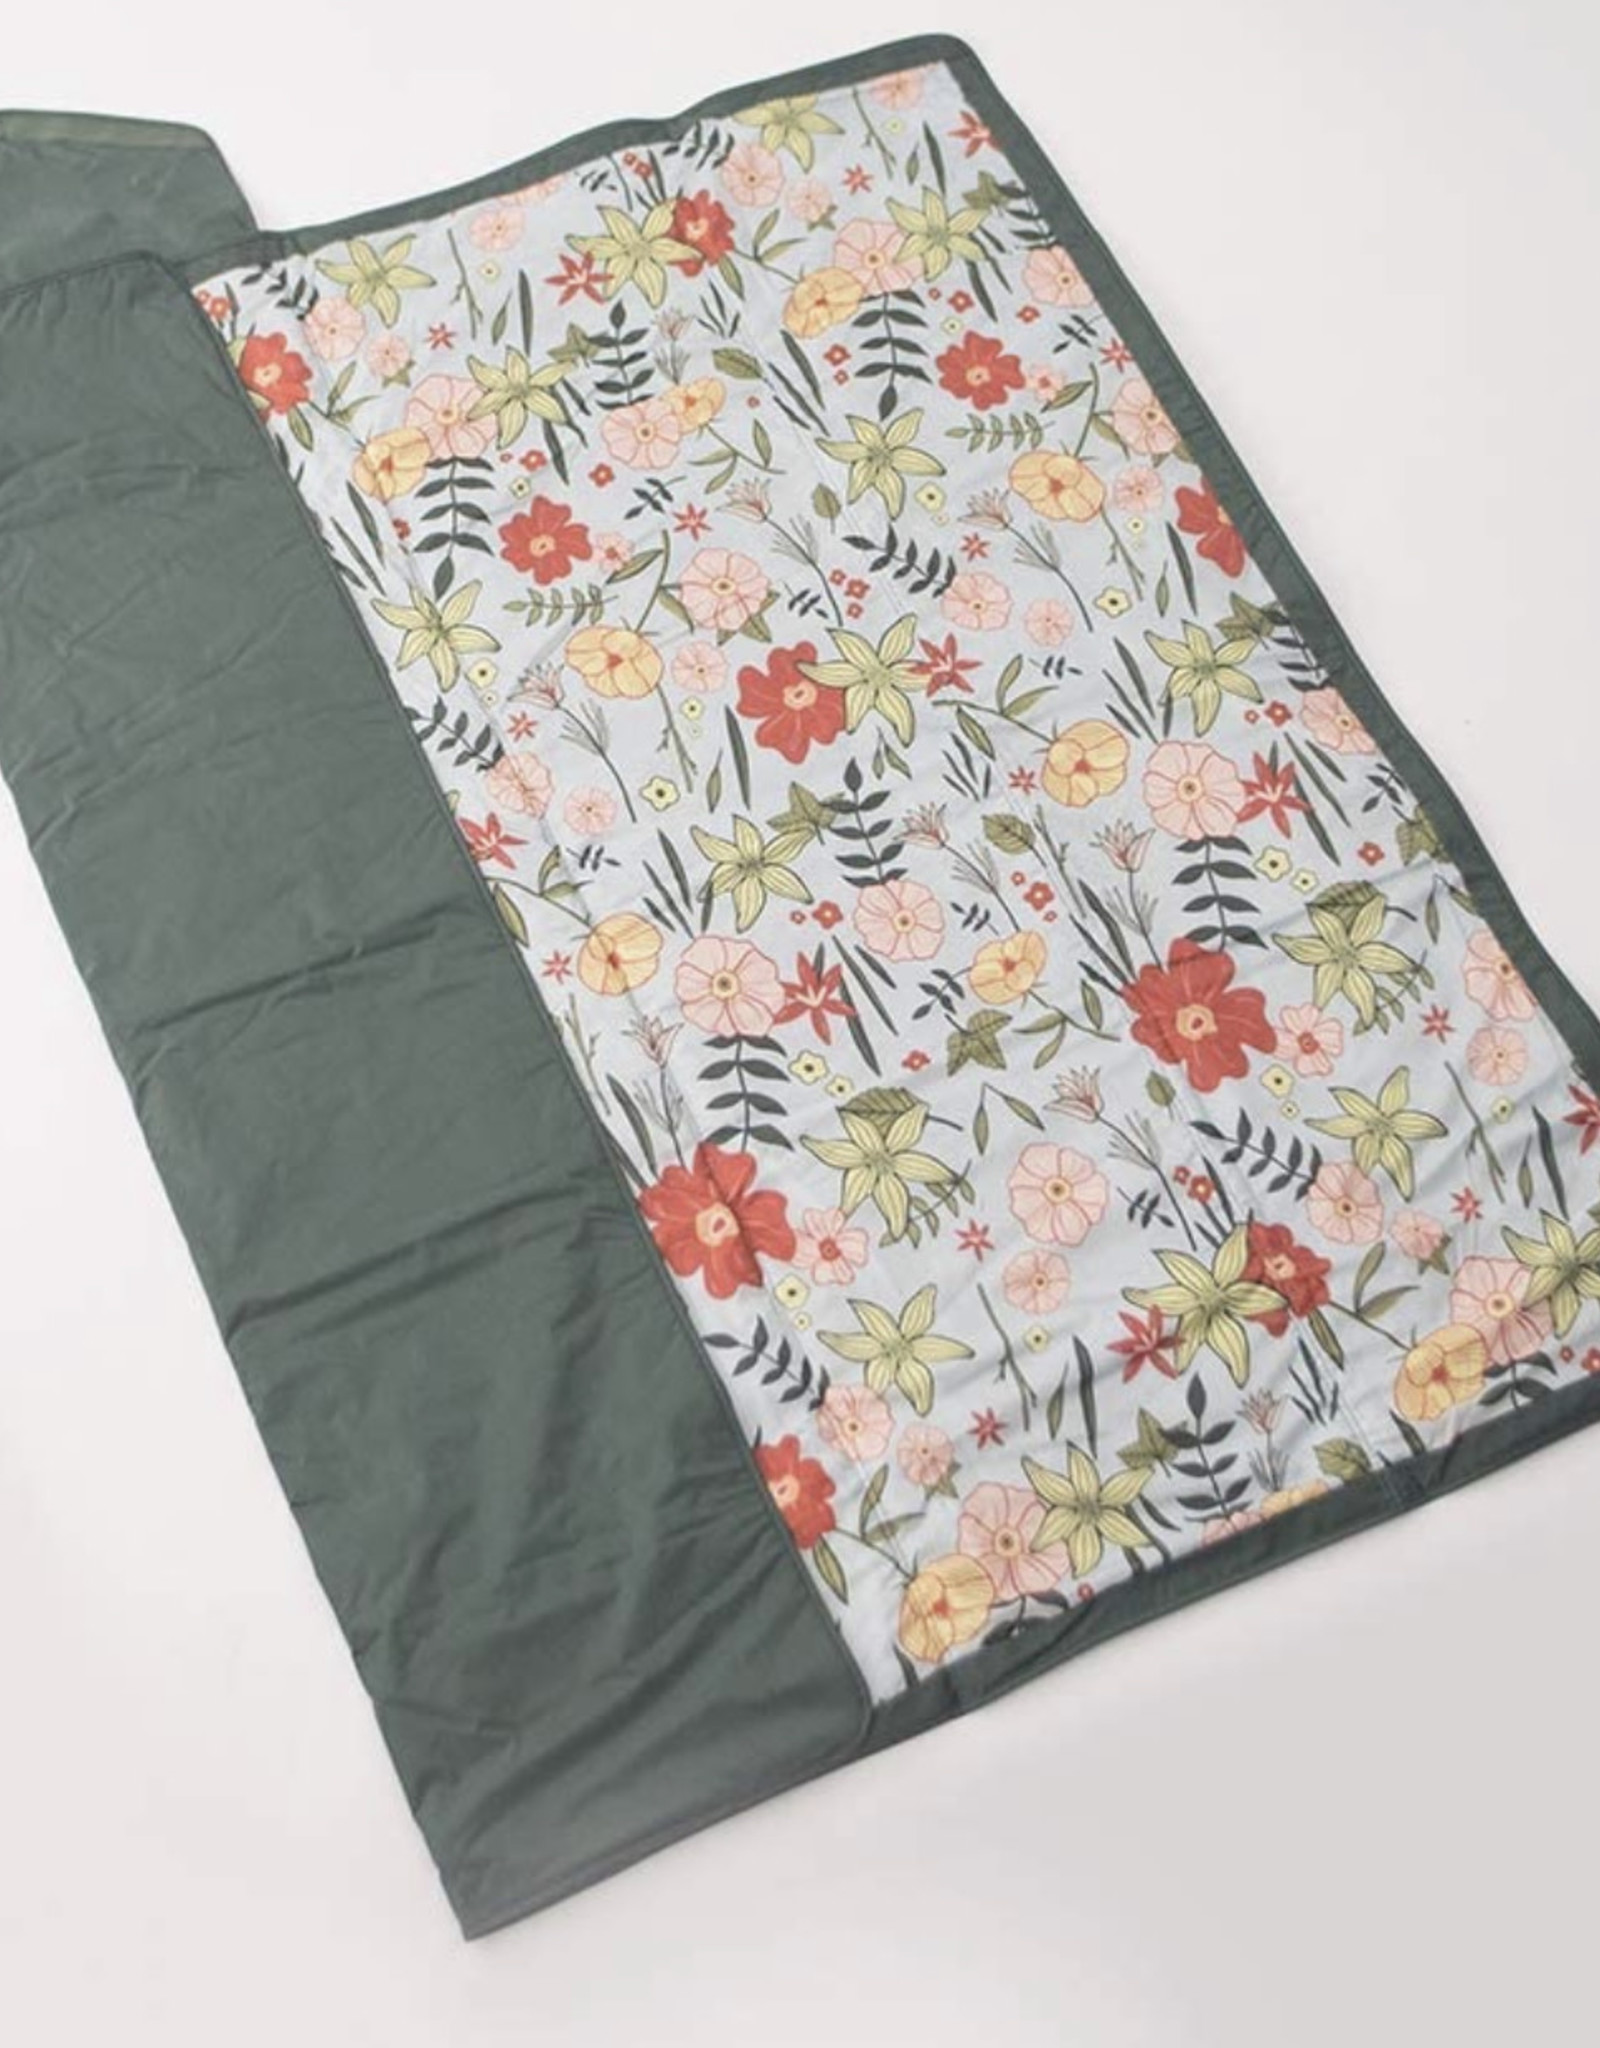 Little Unicorn Little Unicorn - 5 x 5 Outdoor Blanket